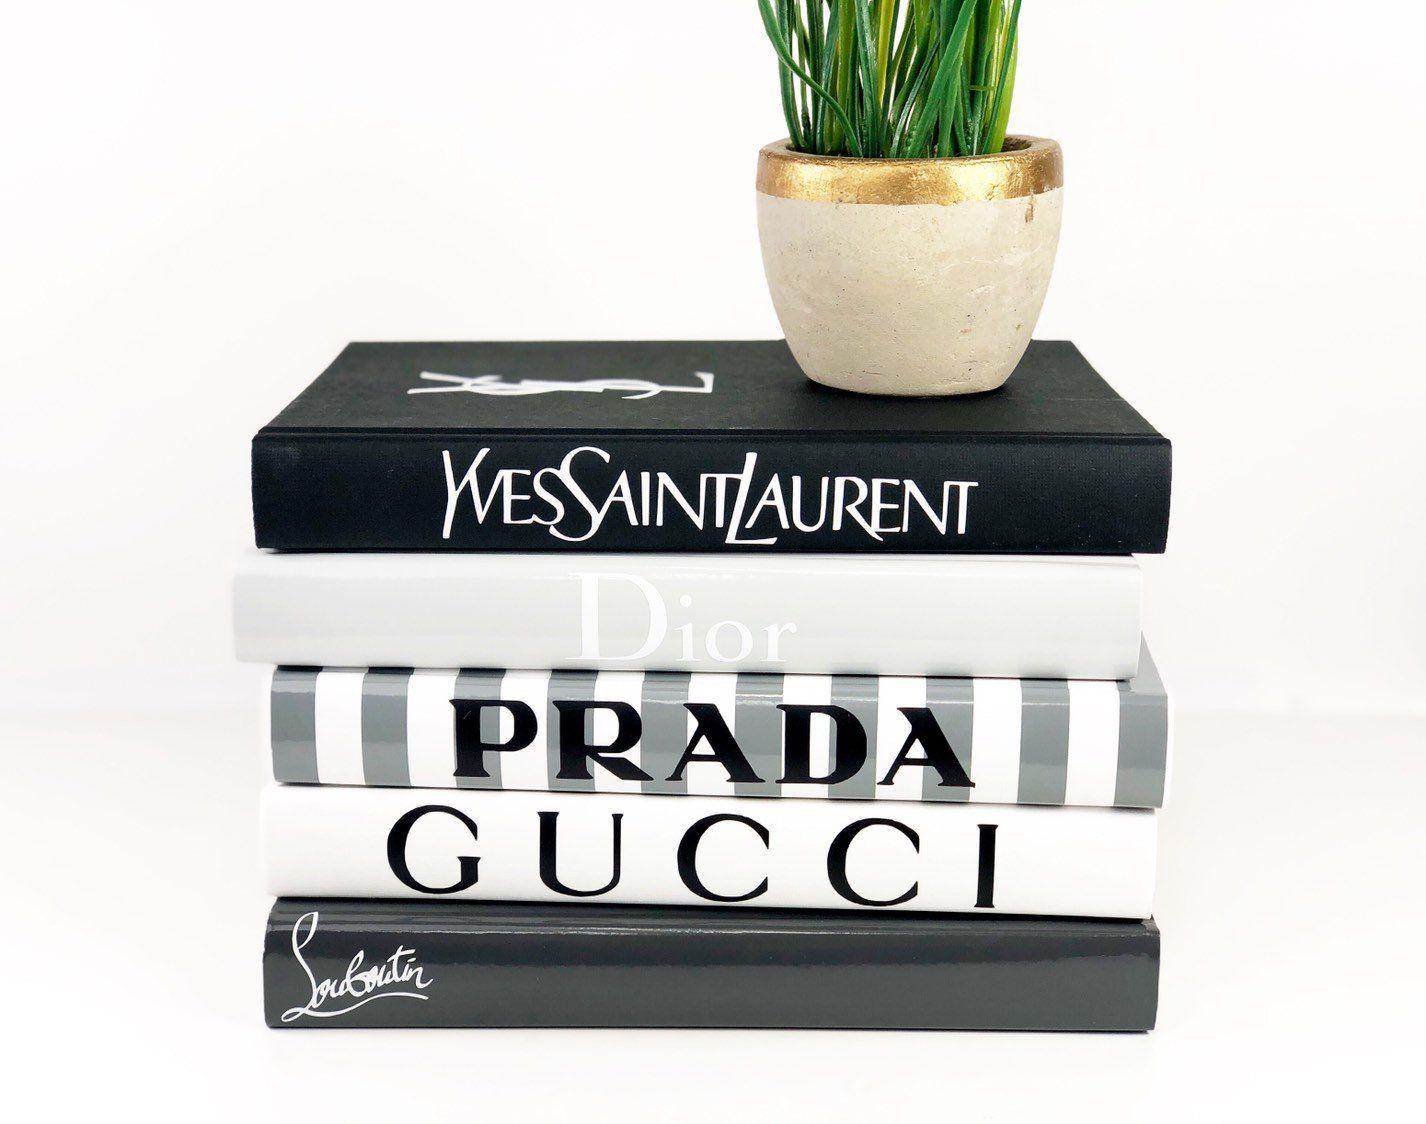 Vanessa Designer Book Set 8 Books Decorative Books Book Decor Chanel Book Decor Book Labels Book Decor